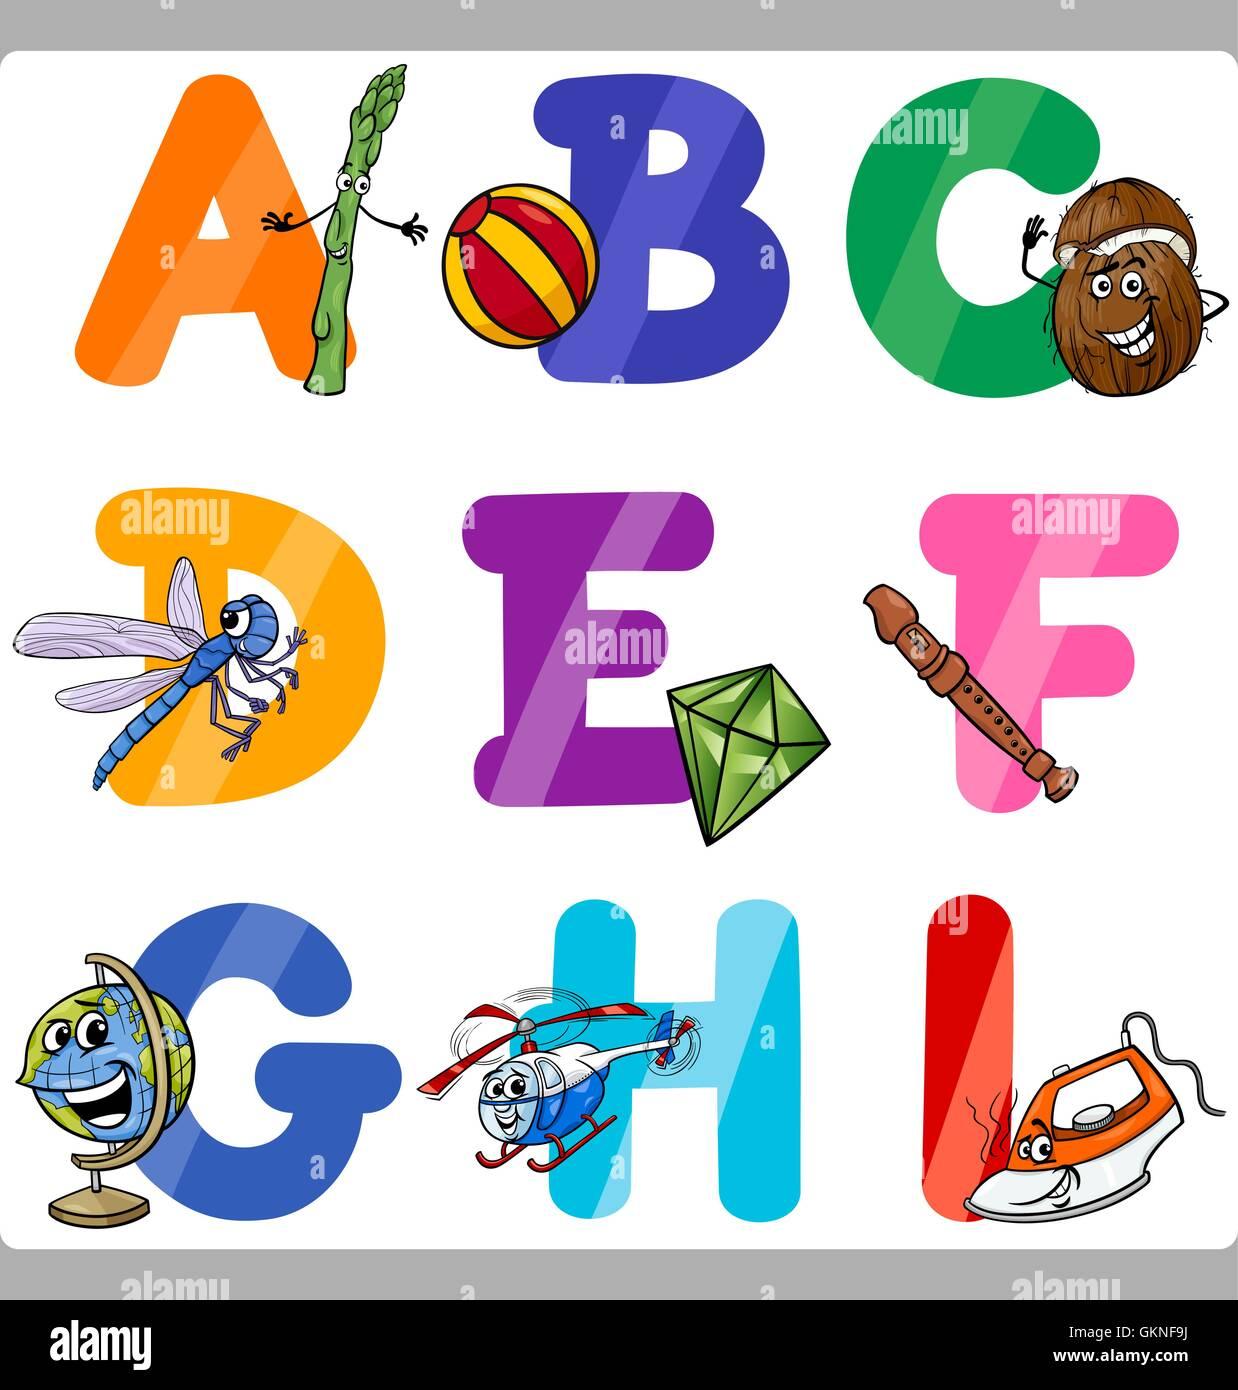 Bildung Abbildung Charakter Kollektion Alphabet Cartoon ABC Kind ...